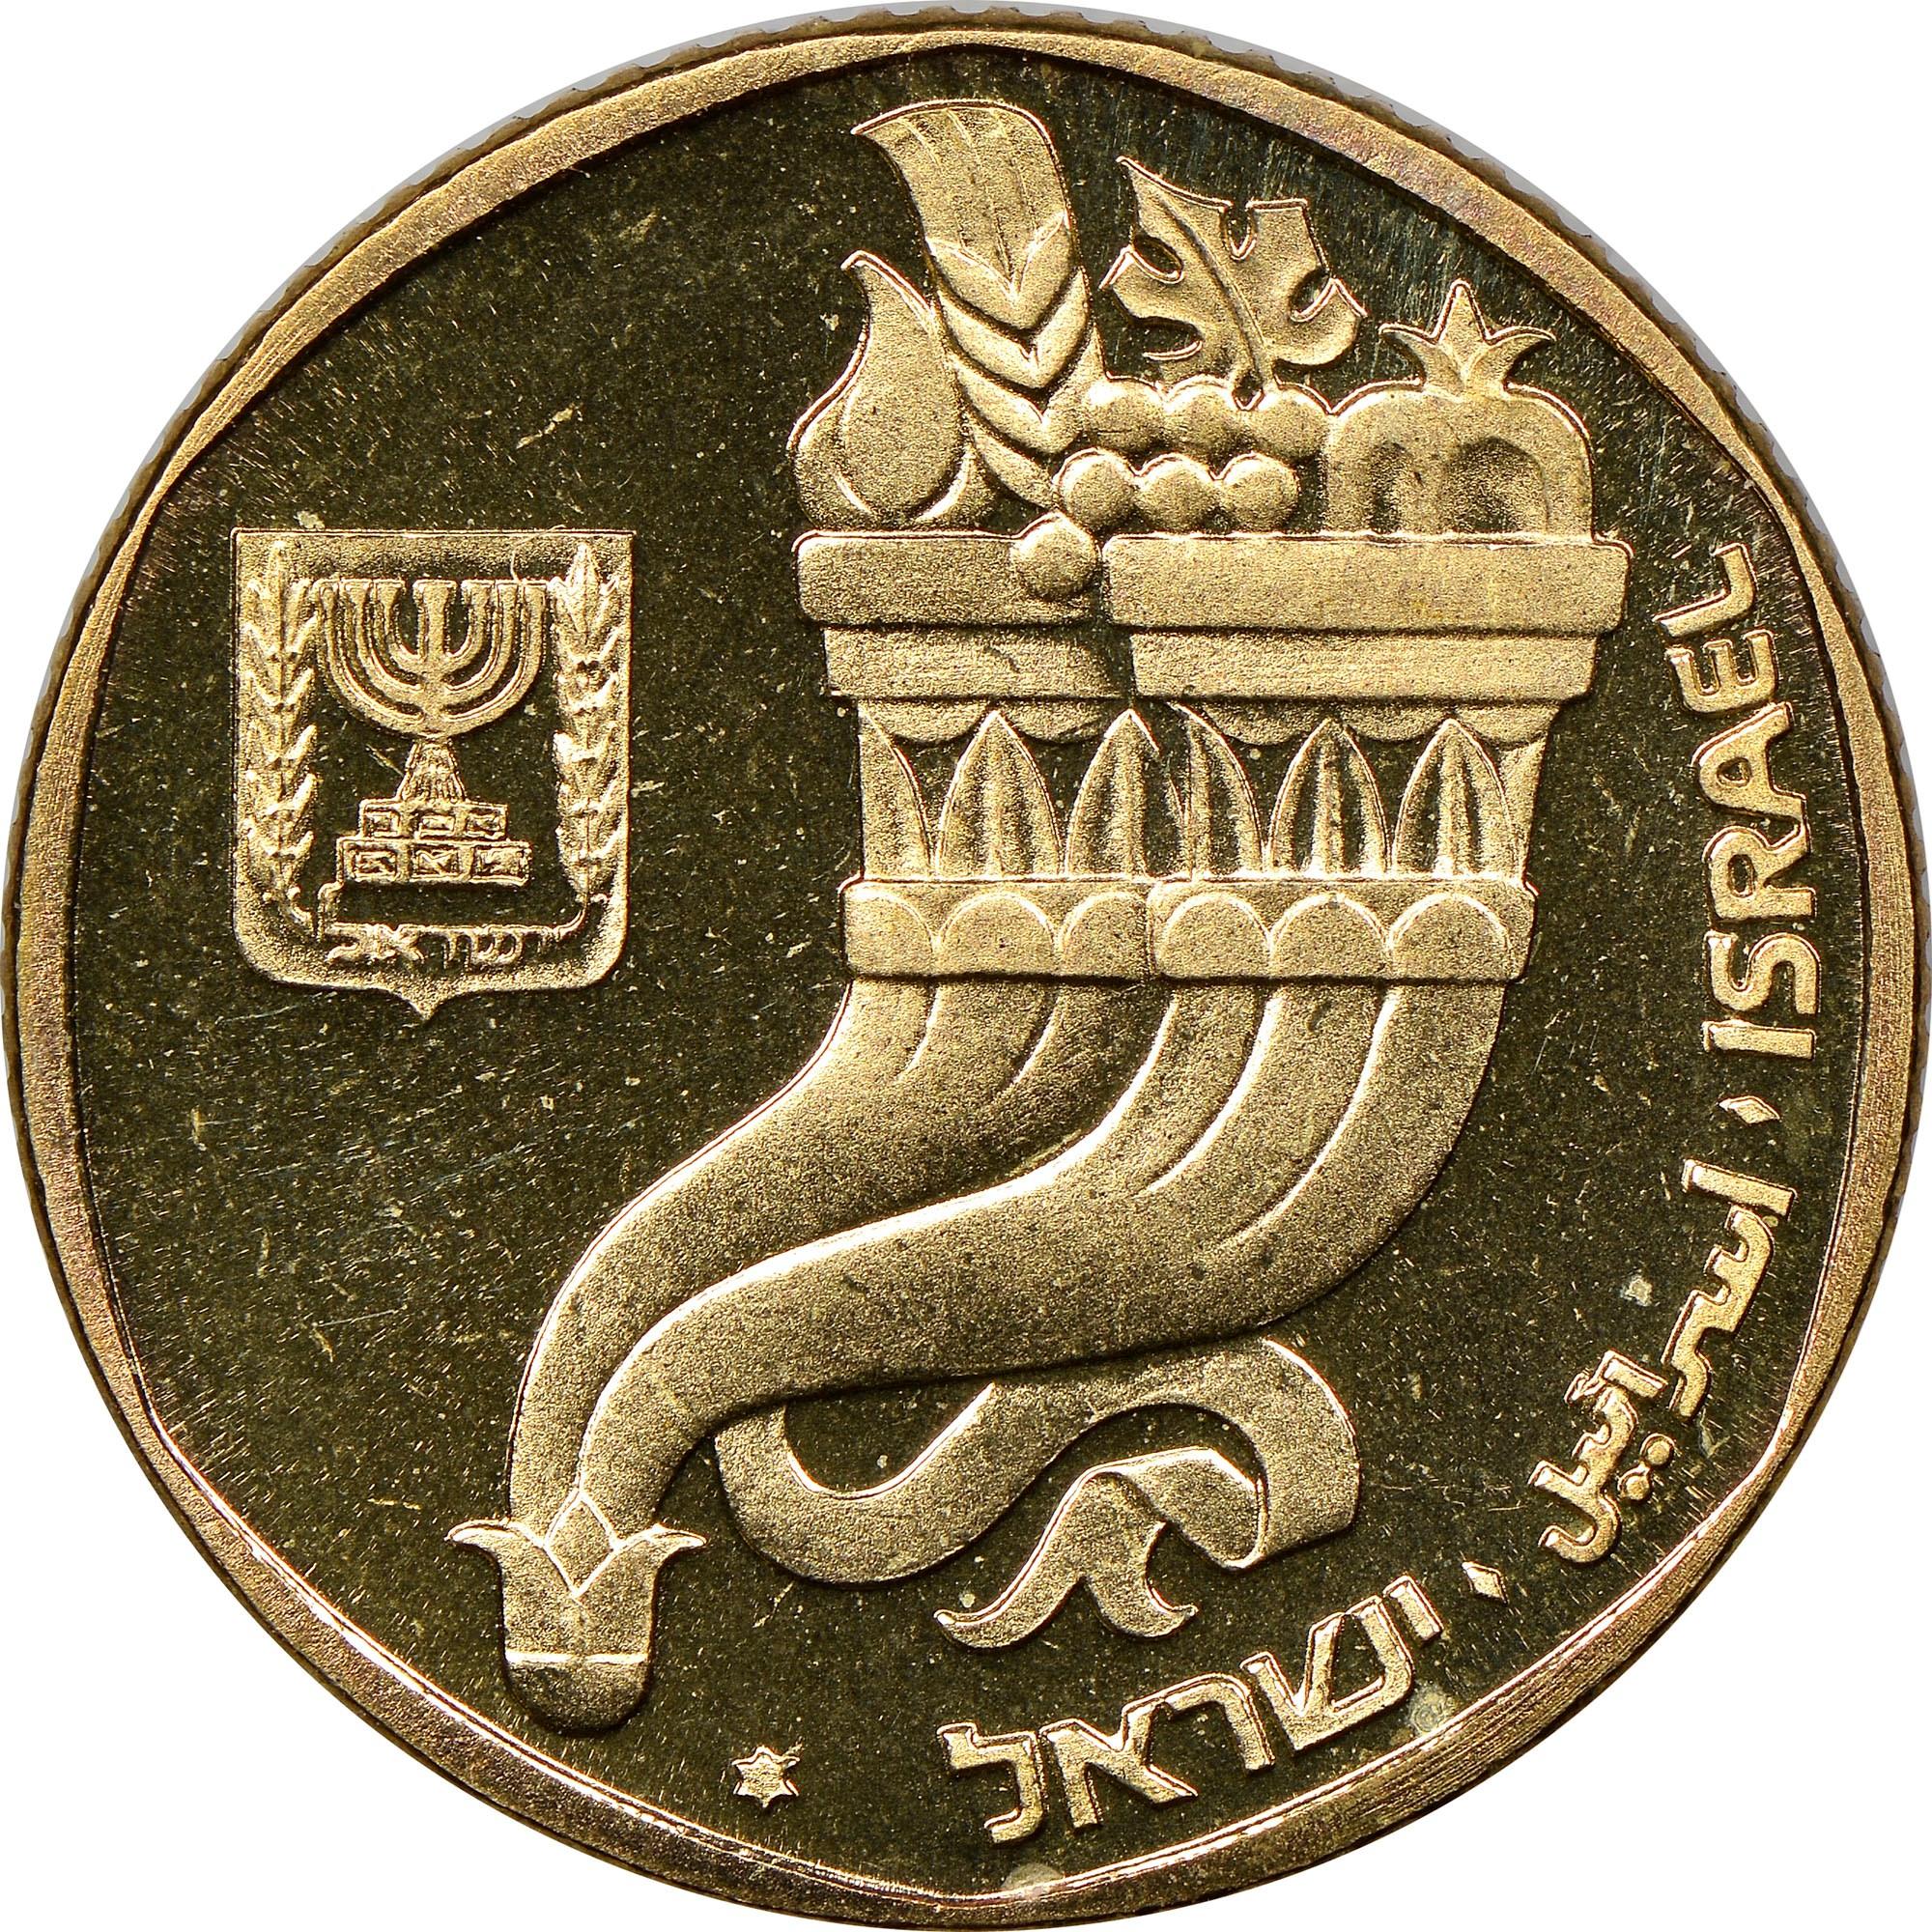 Israel 5 Sheqalim obverse